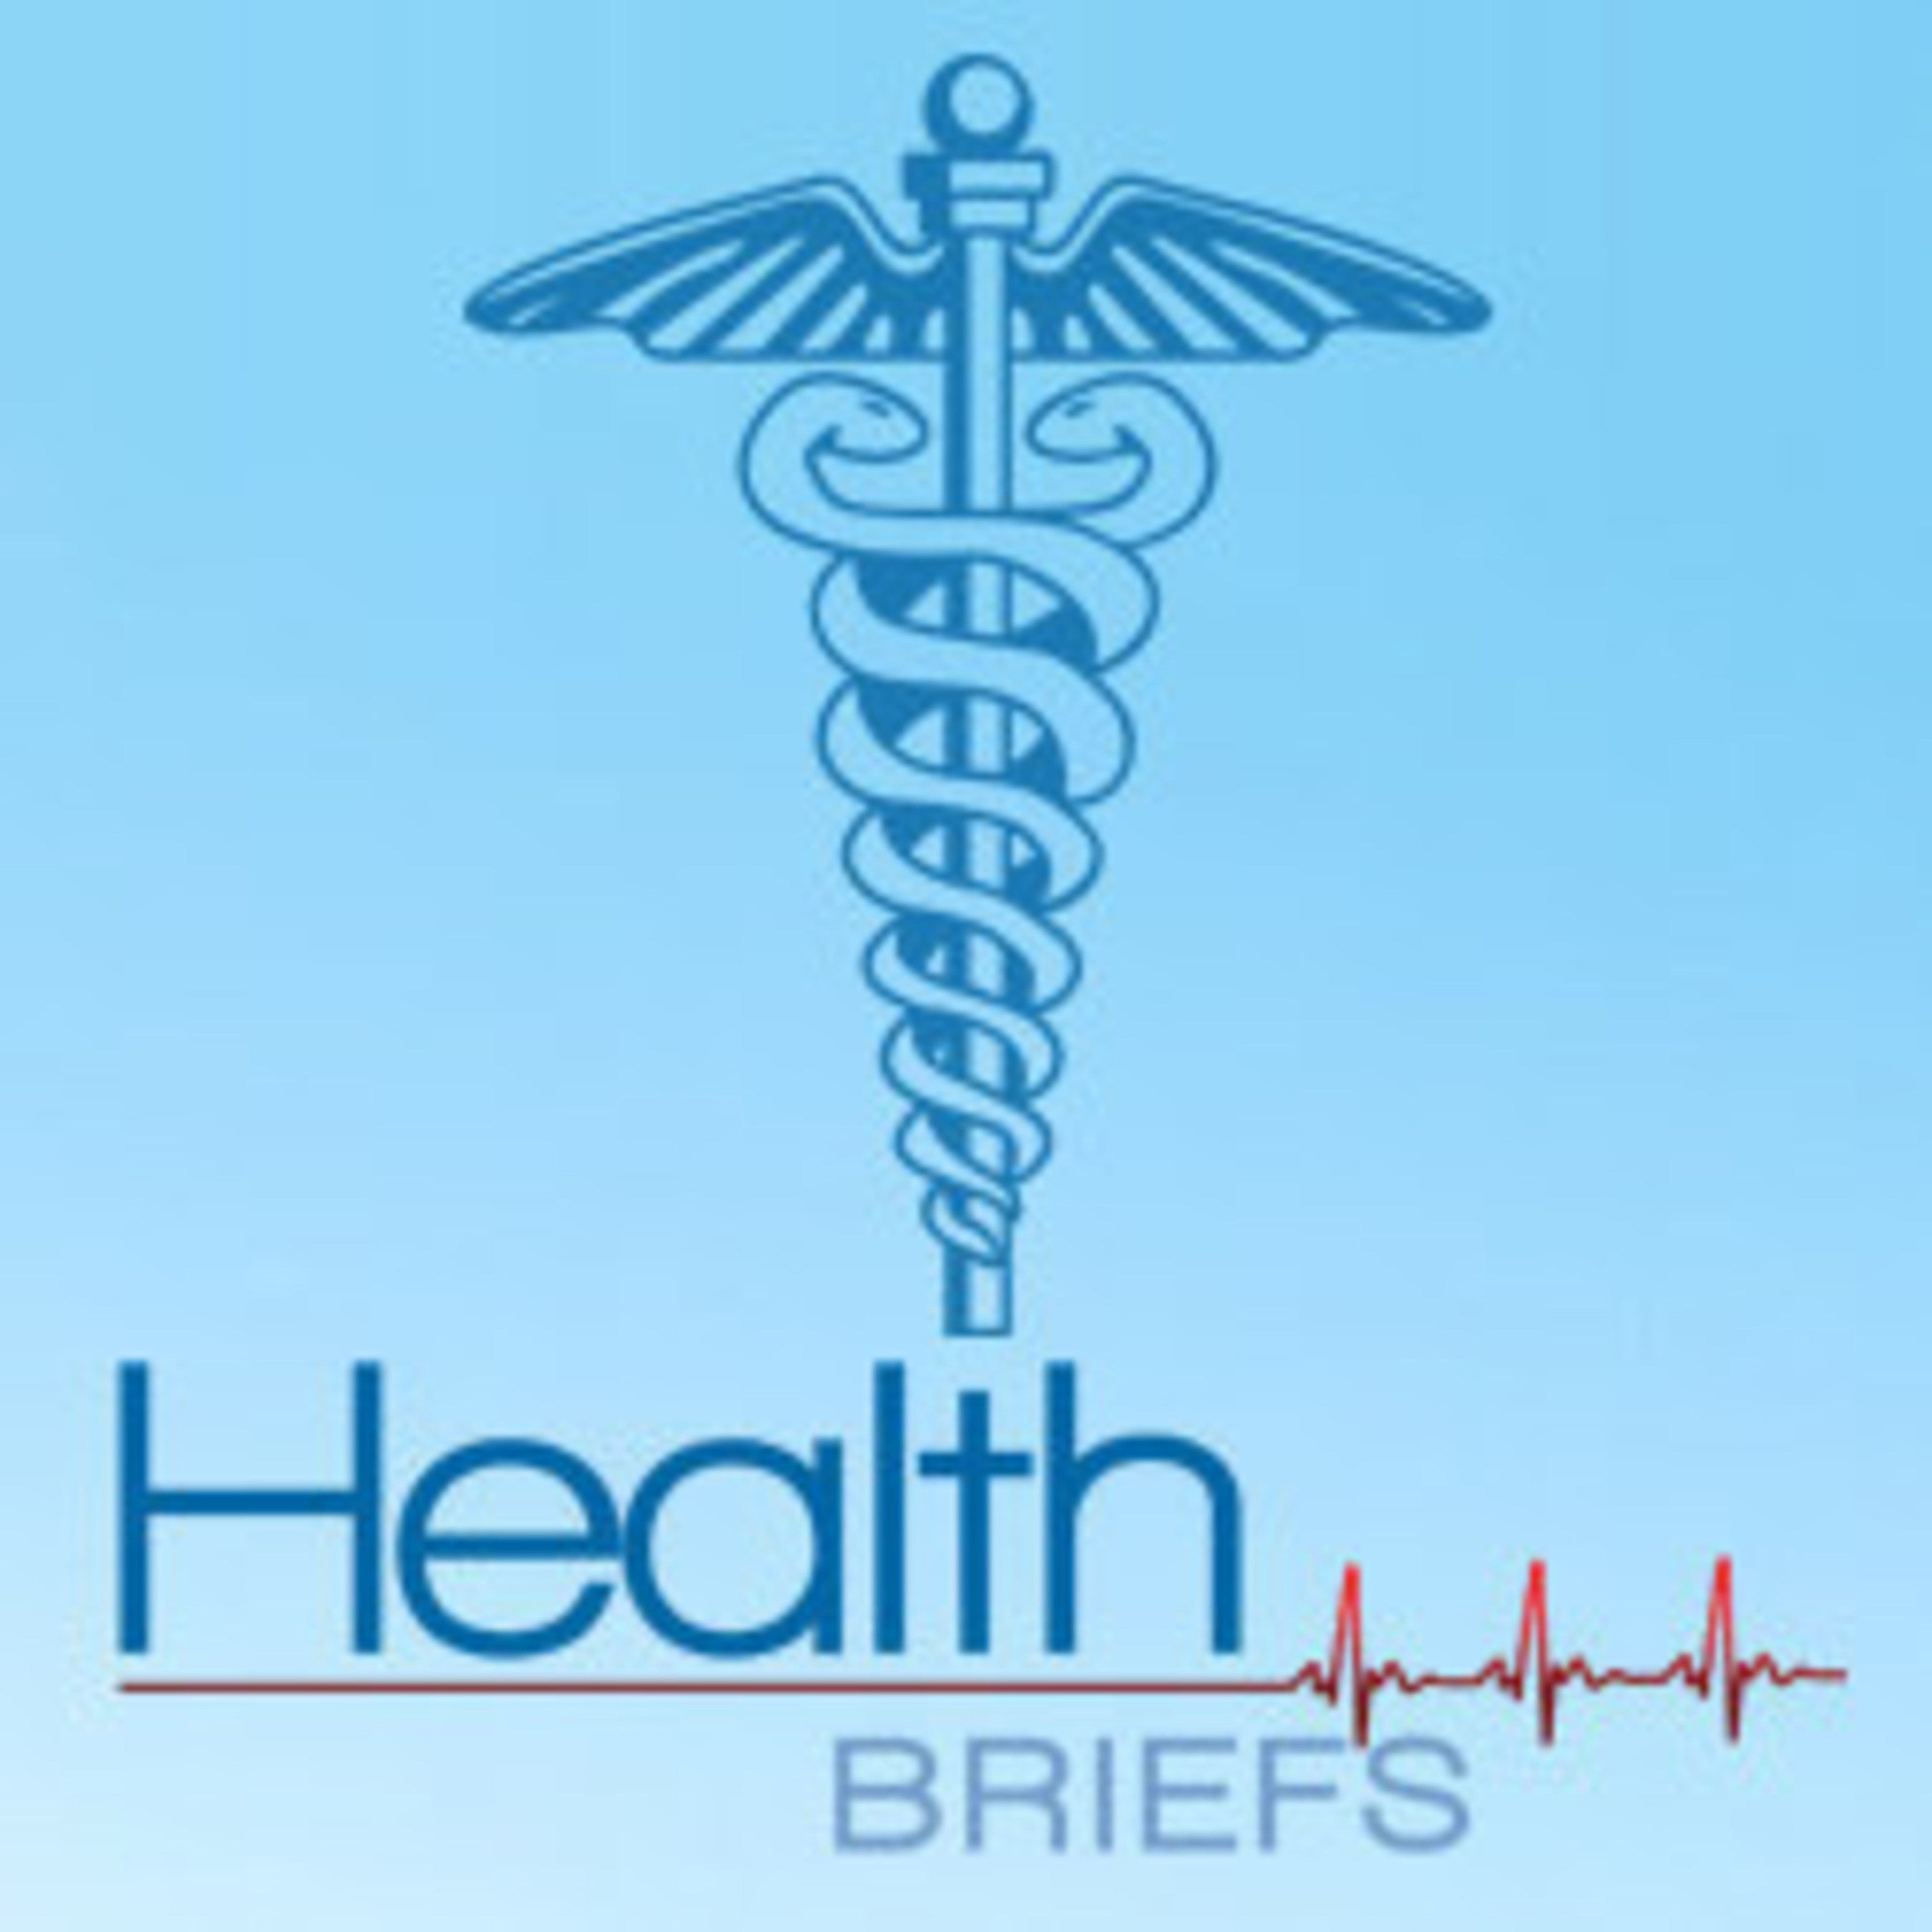 Health Briefs TV to Present Segment on Prostate Cancer